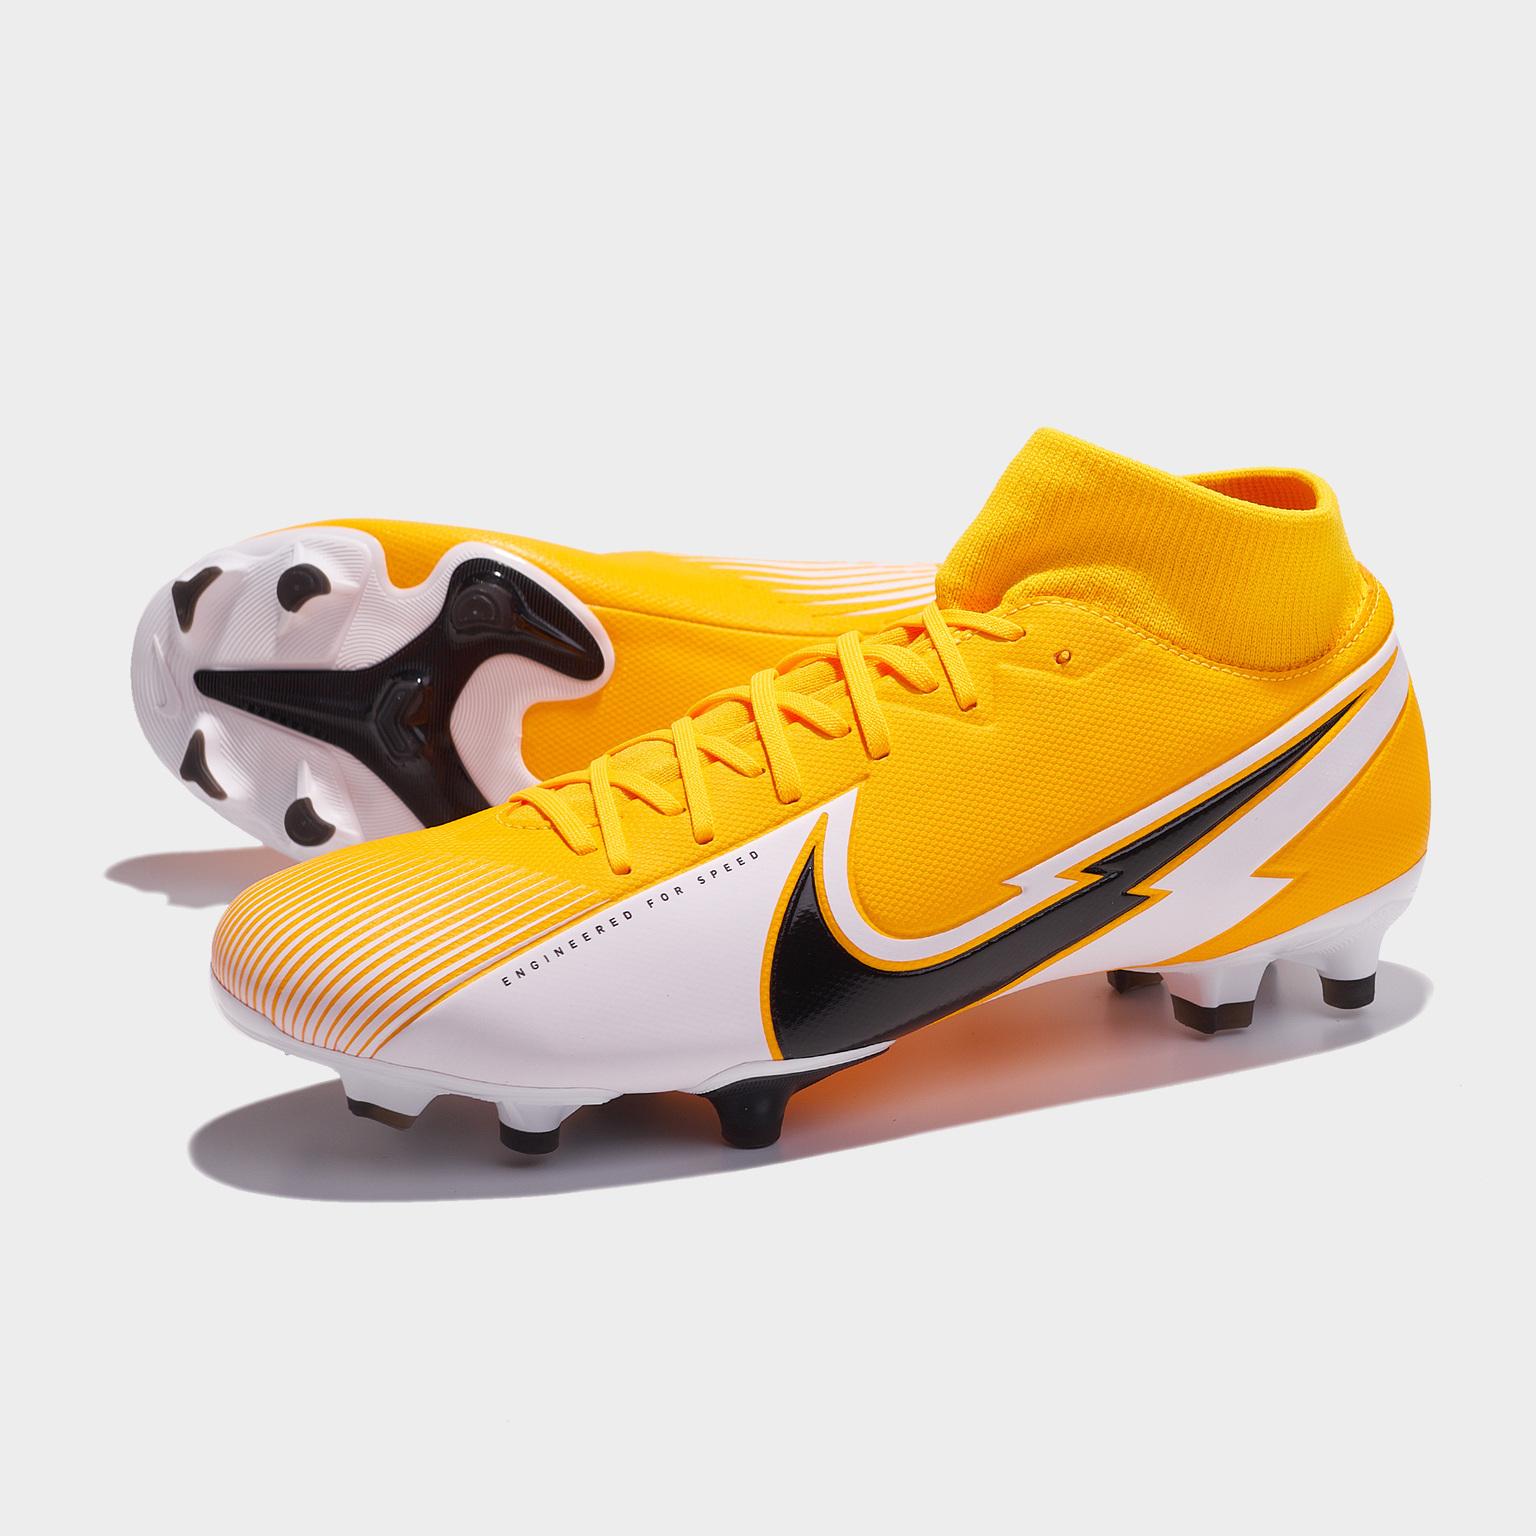 Бутсы Nike Superfly 7 Academy FG/MG AT7946-801 бутсы nike superfly 7 academy fg mg at7946 606